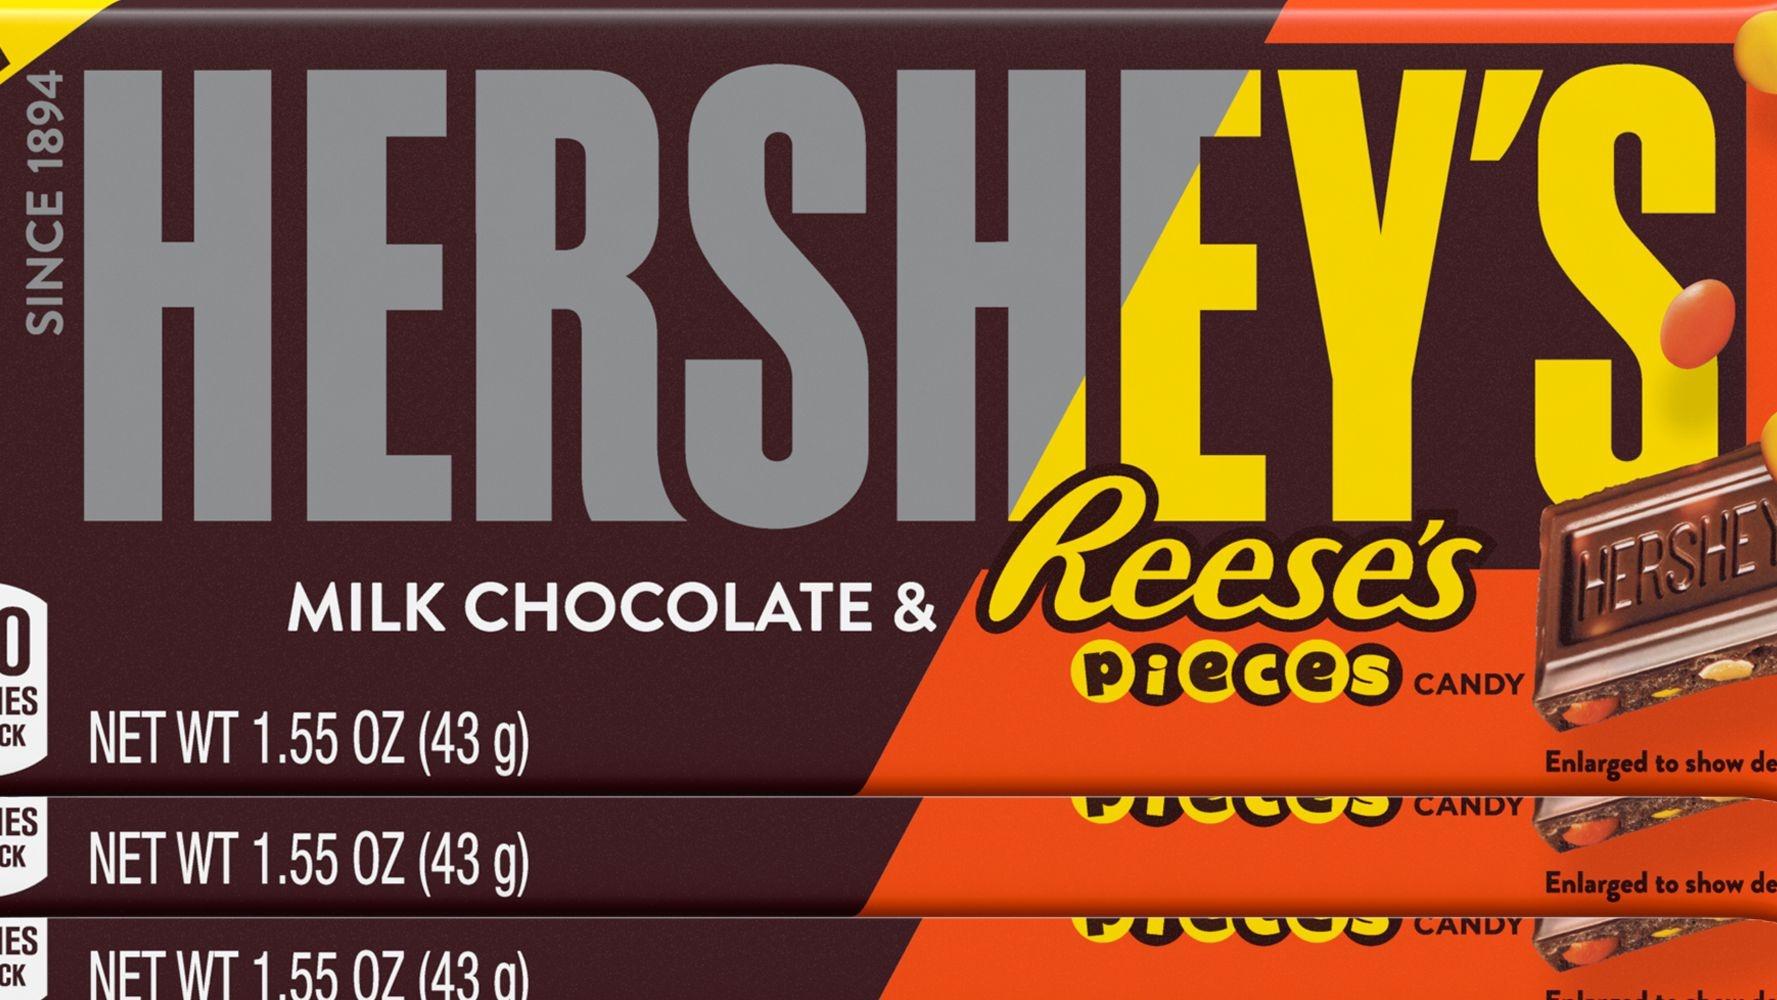 hersheys-2-1539270509 Cropped